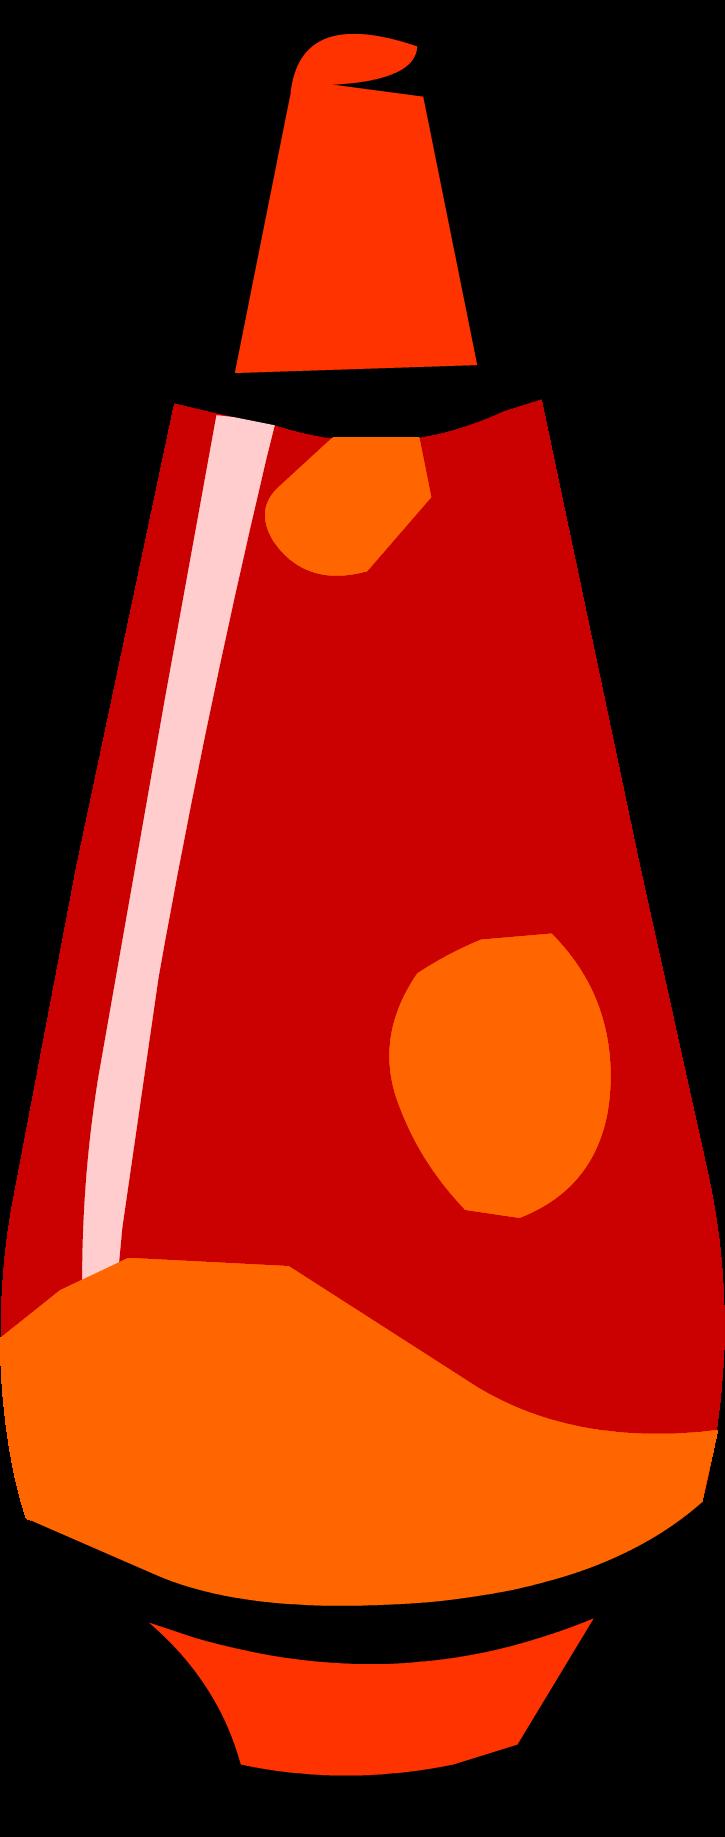 Lava club penguin rewritten. Lamp clipart red lamp